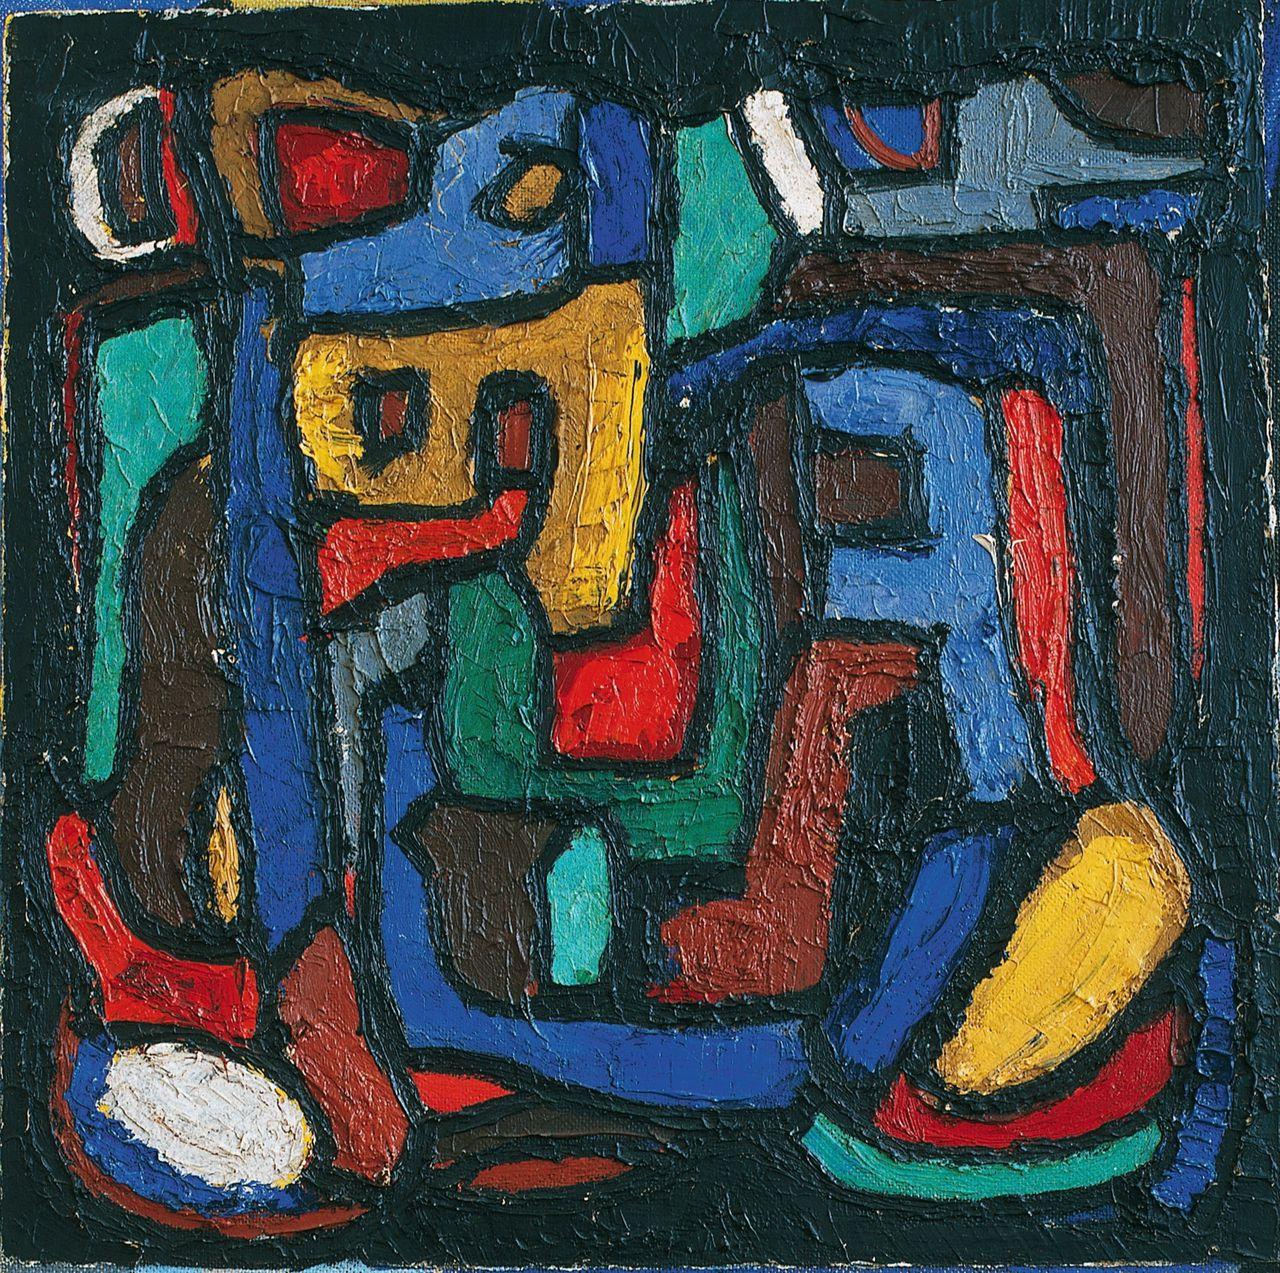 Ad Snijders, Untitled (1956). Olieverf op hardboard, 55 × 55 cm.